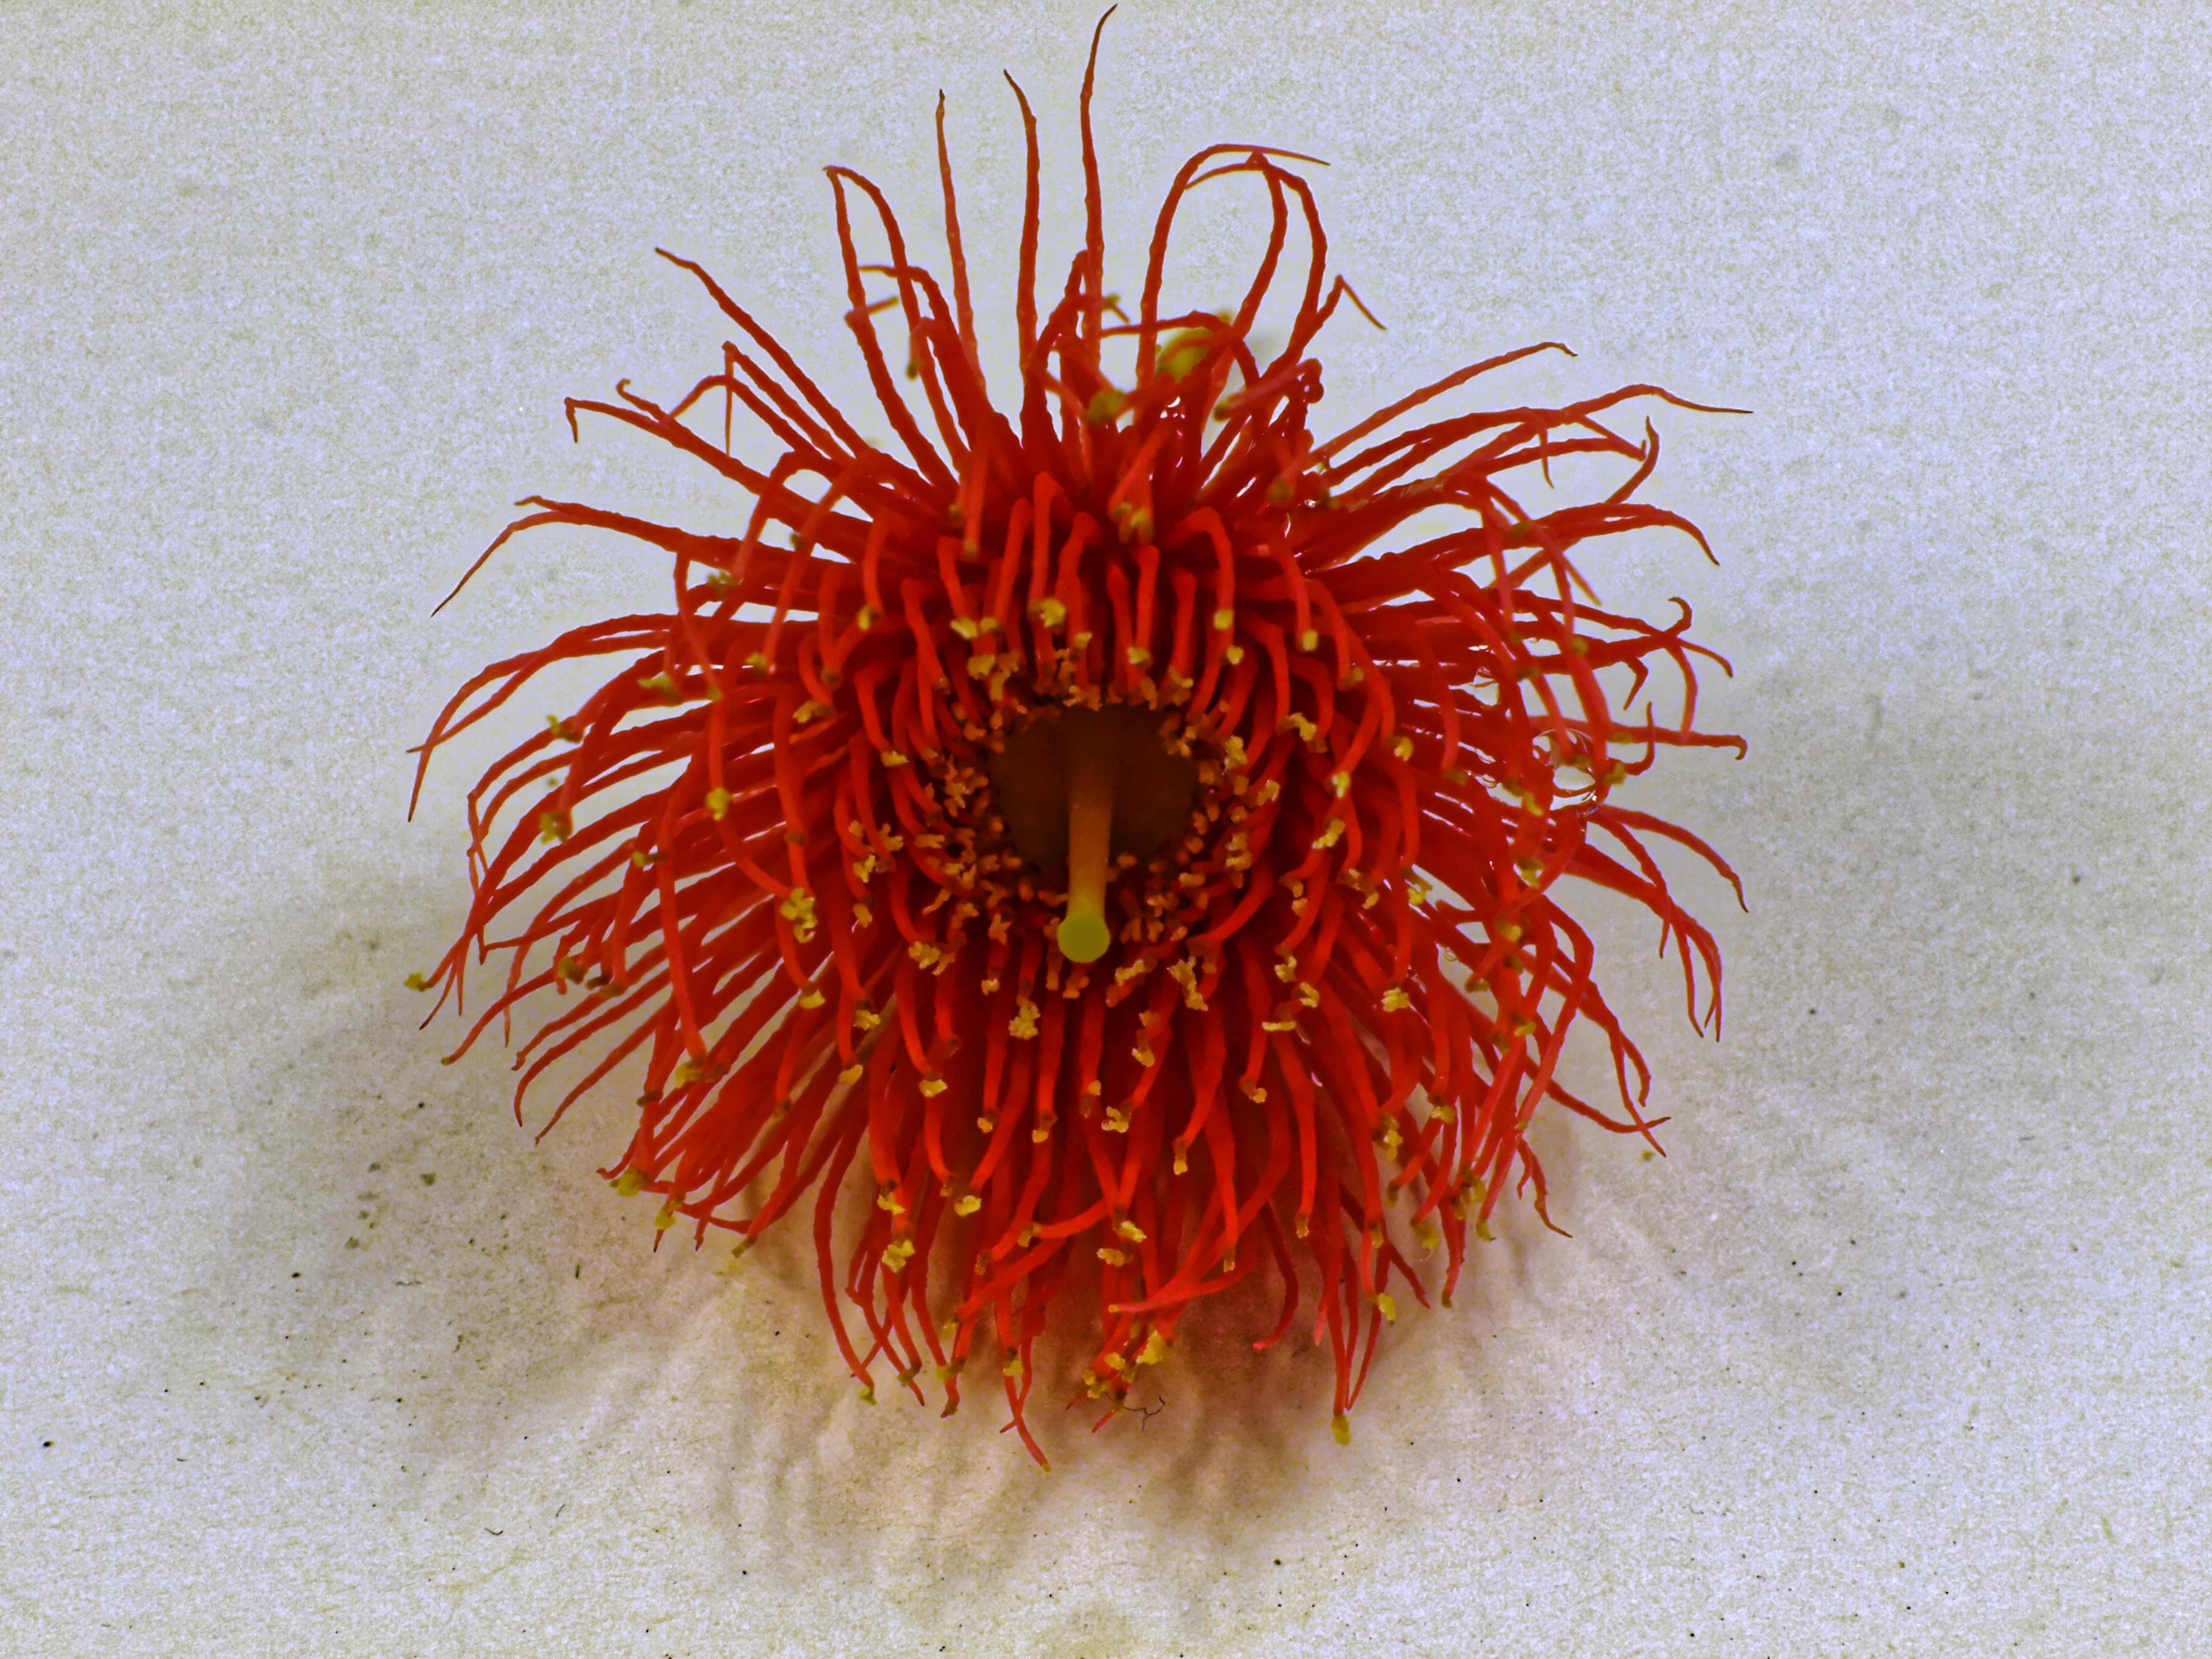 gum-flower-8.jpeg